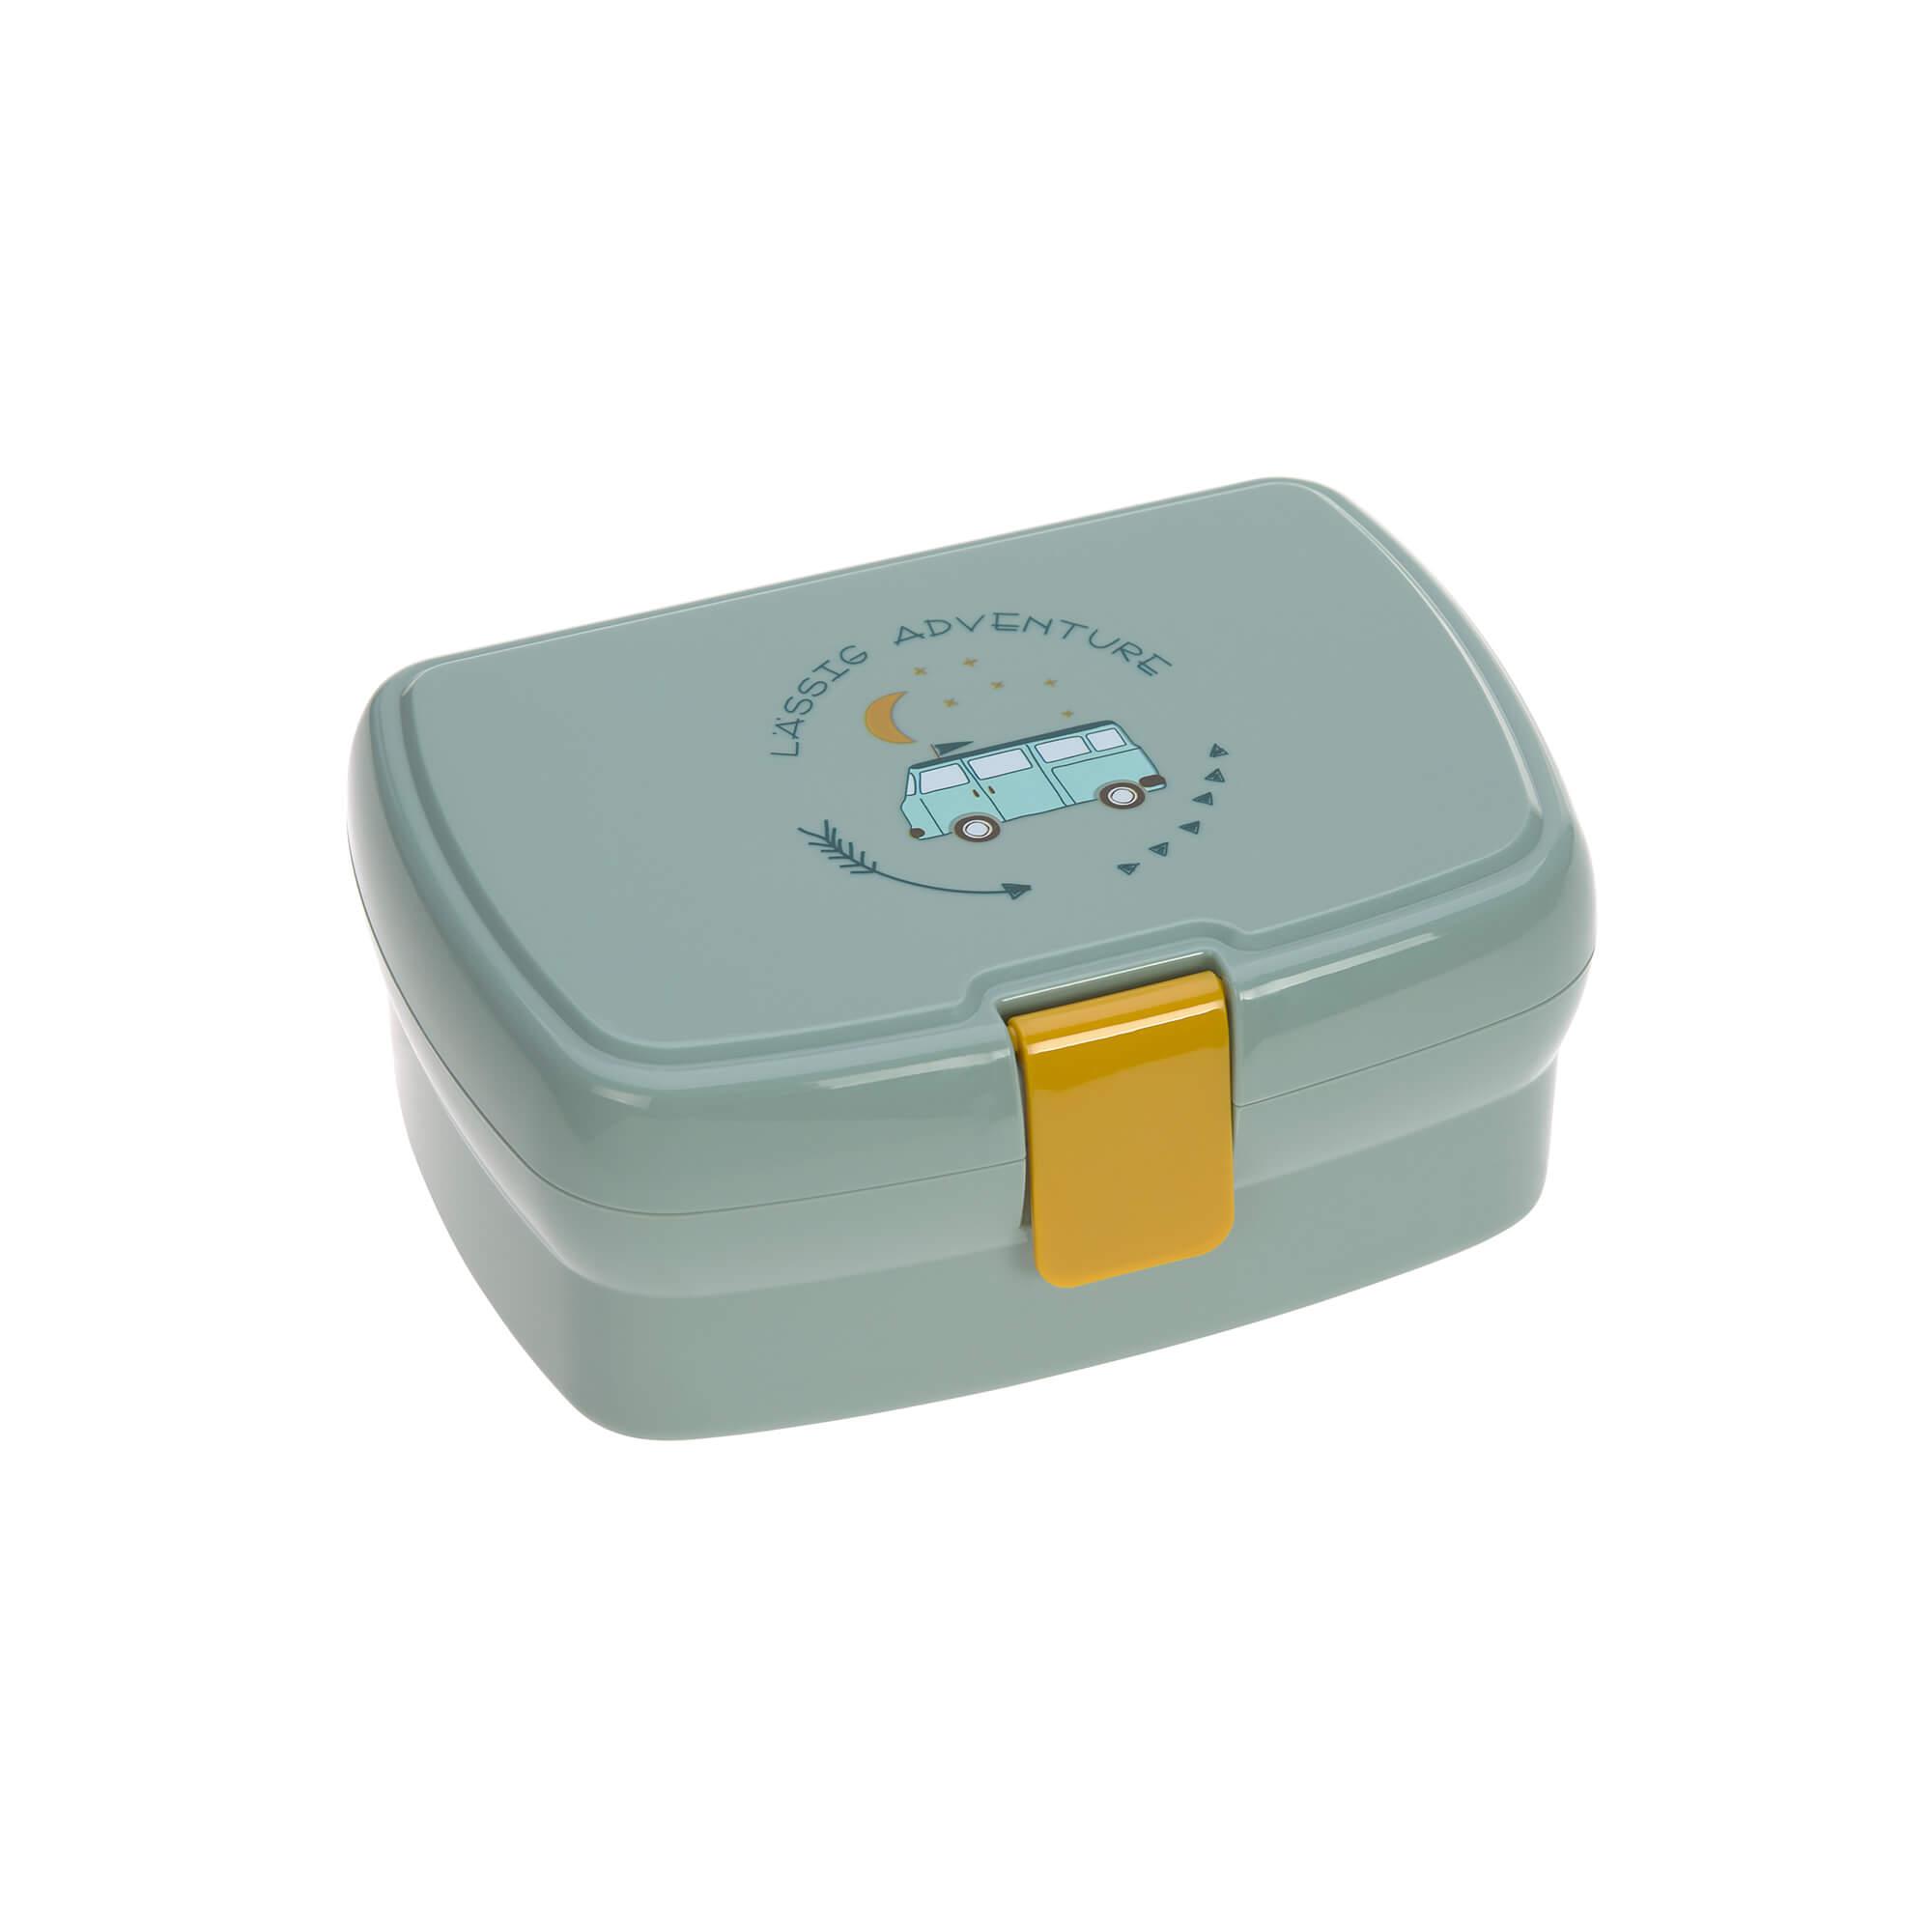 Kinder Brotdose - Lunchbox -  Adventure Bus - Lässig